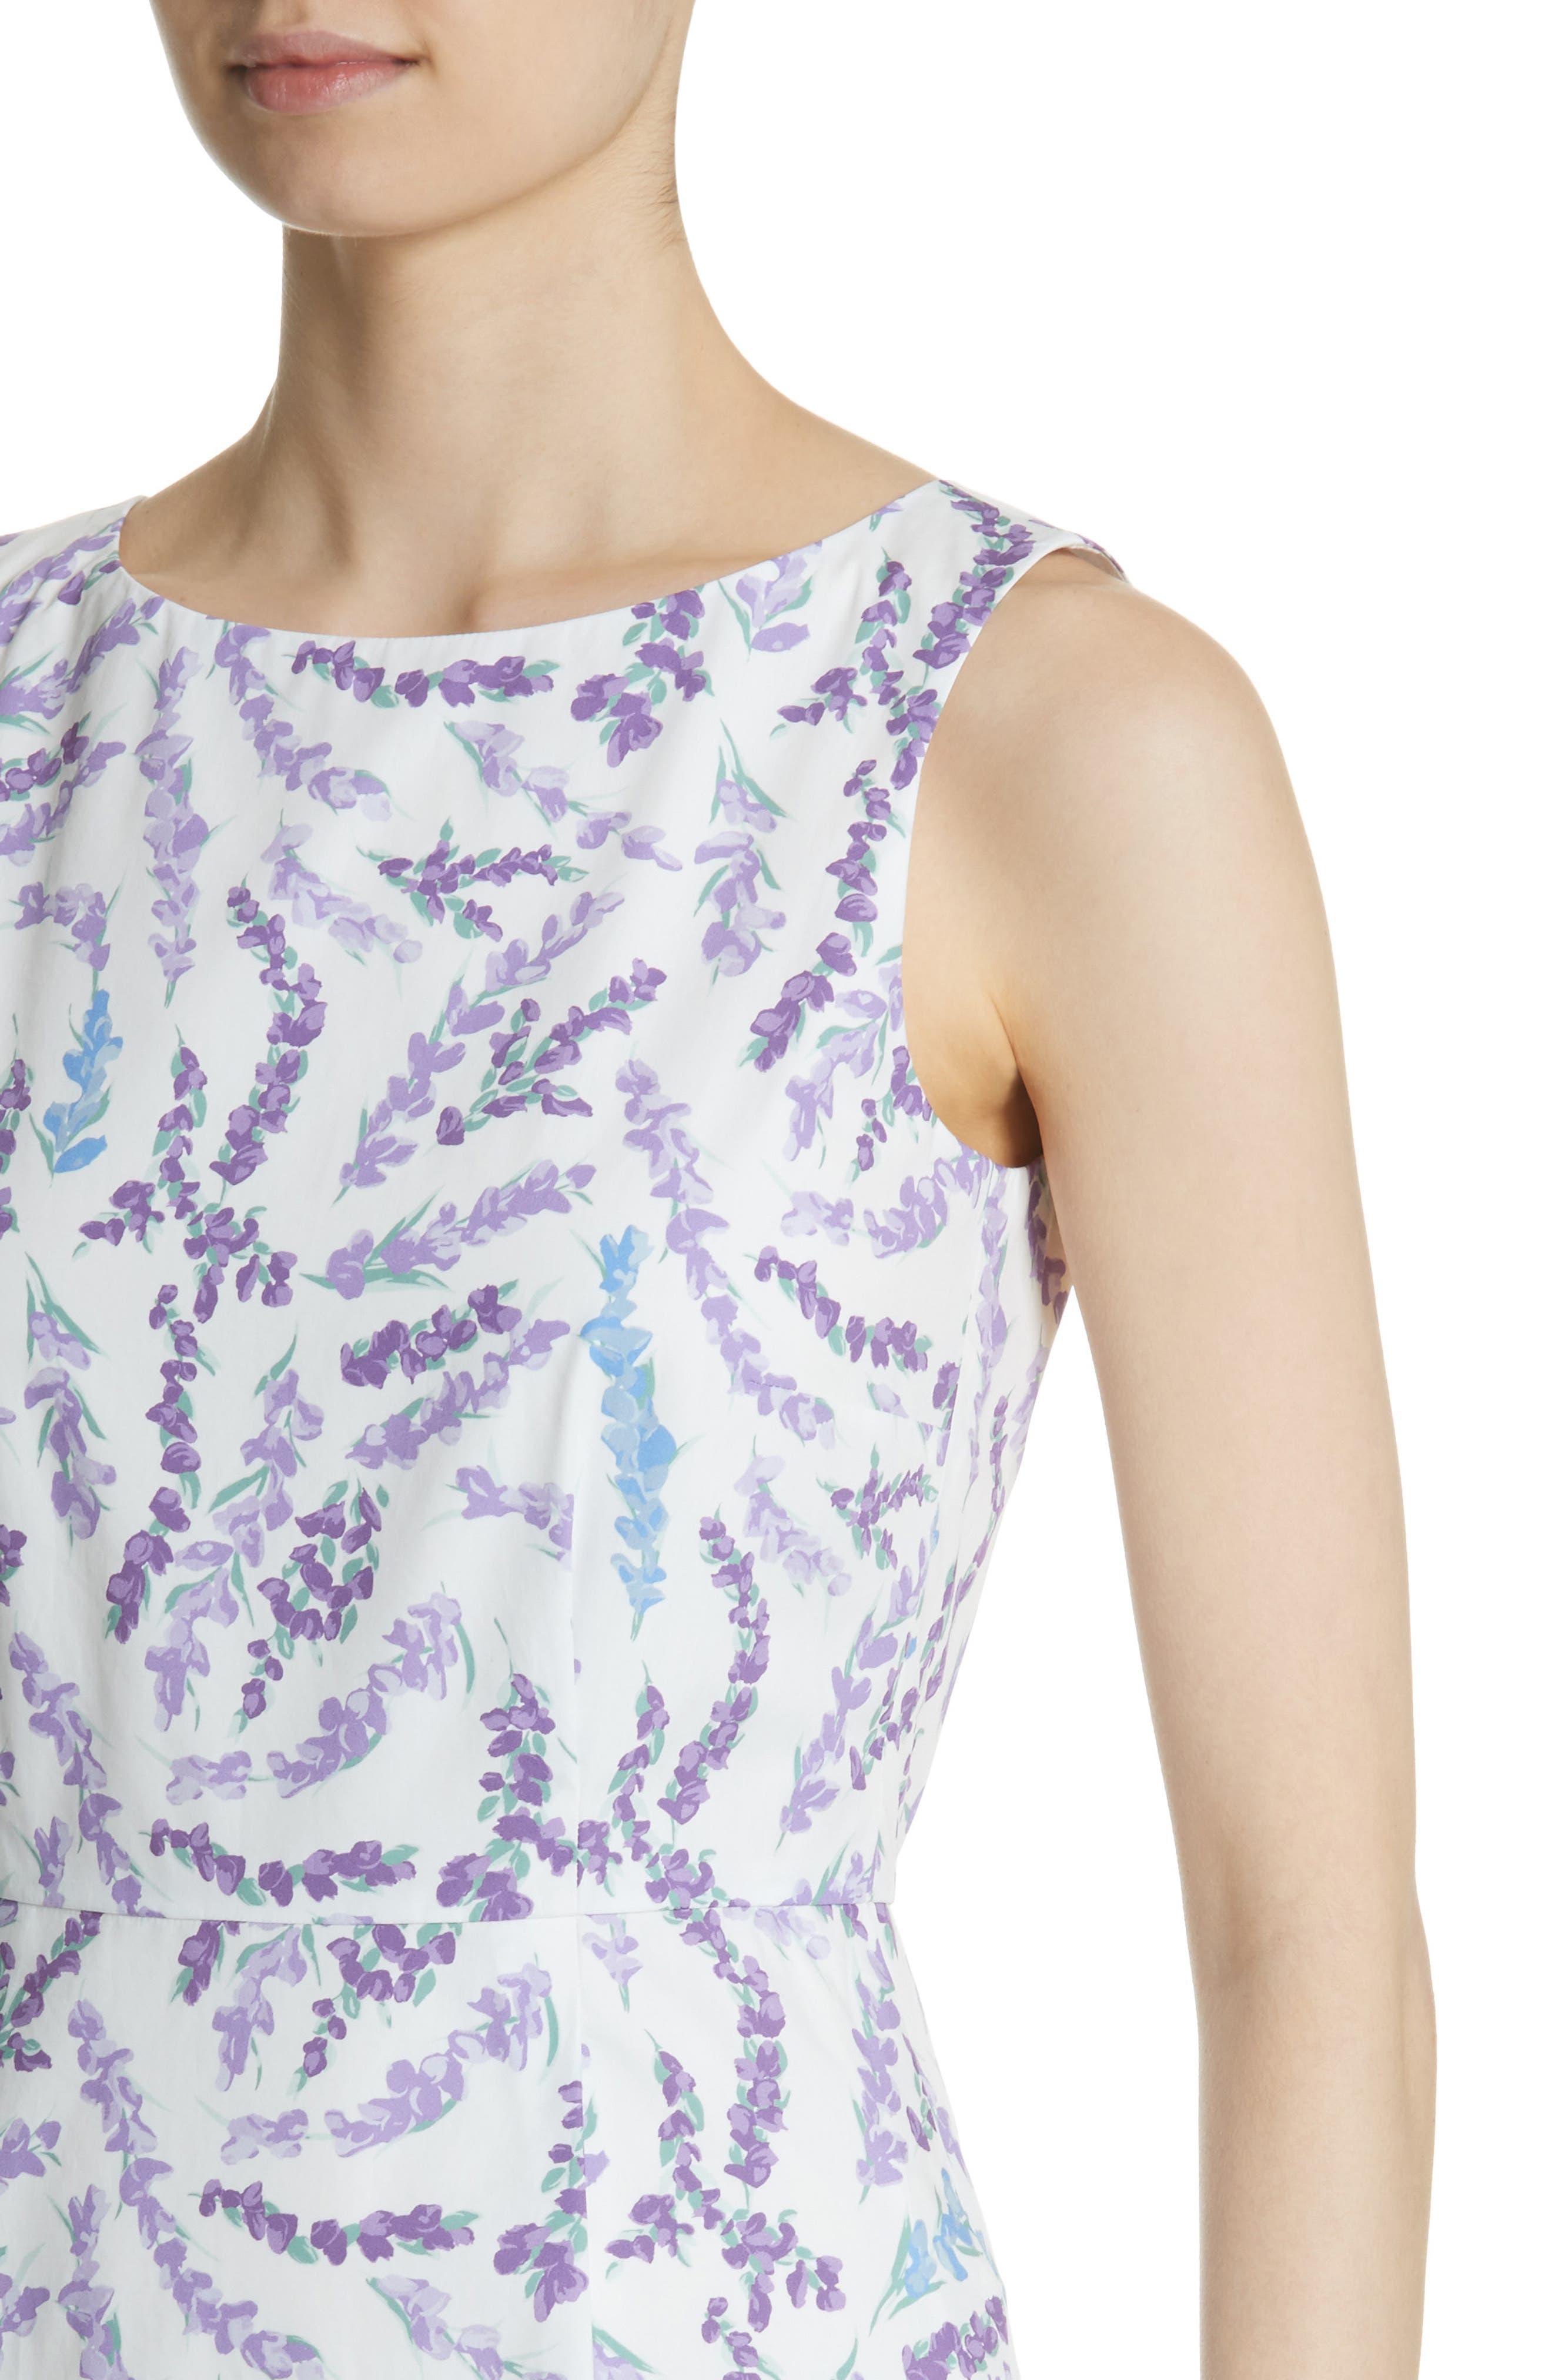 Melfi Print Cotton Sheath Dress,                             Alternate thumbnail 4, color,                             Lavender